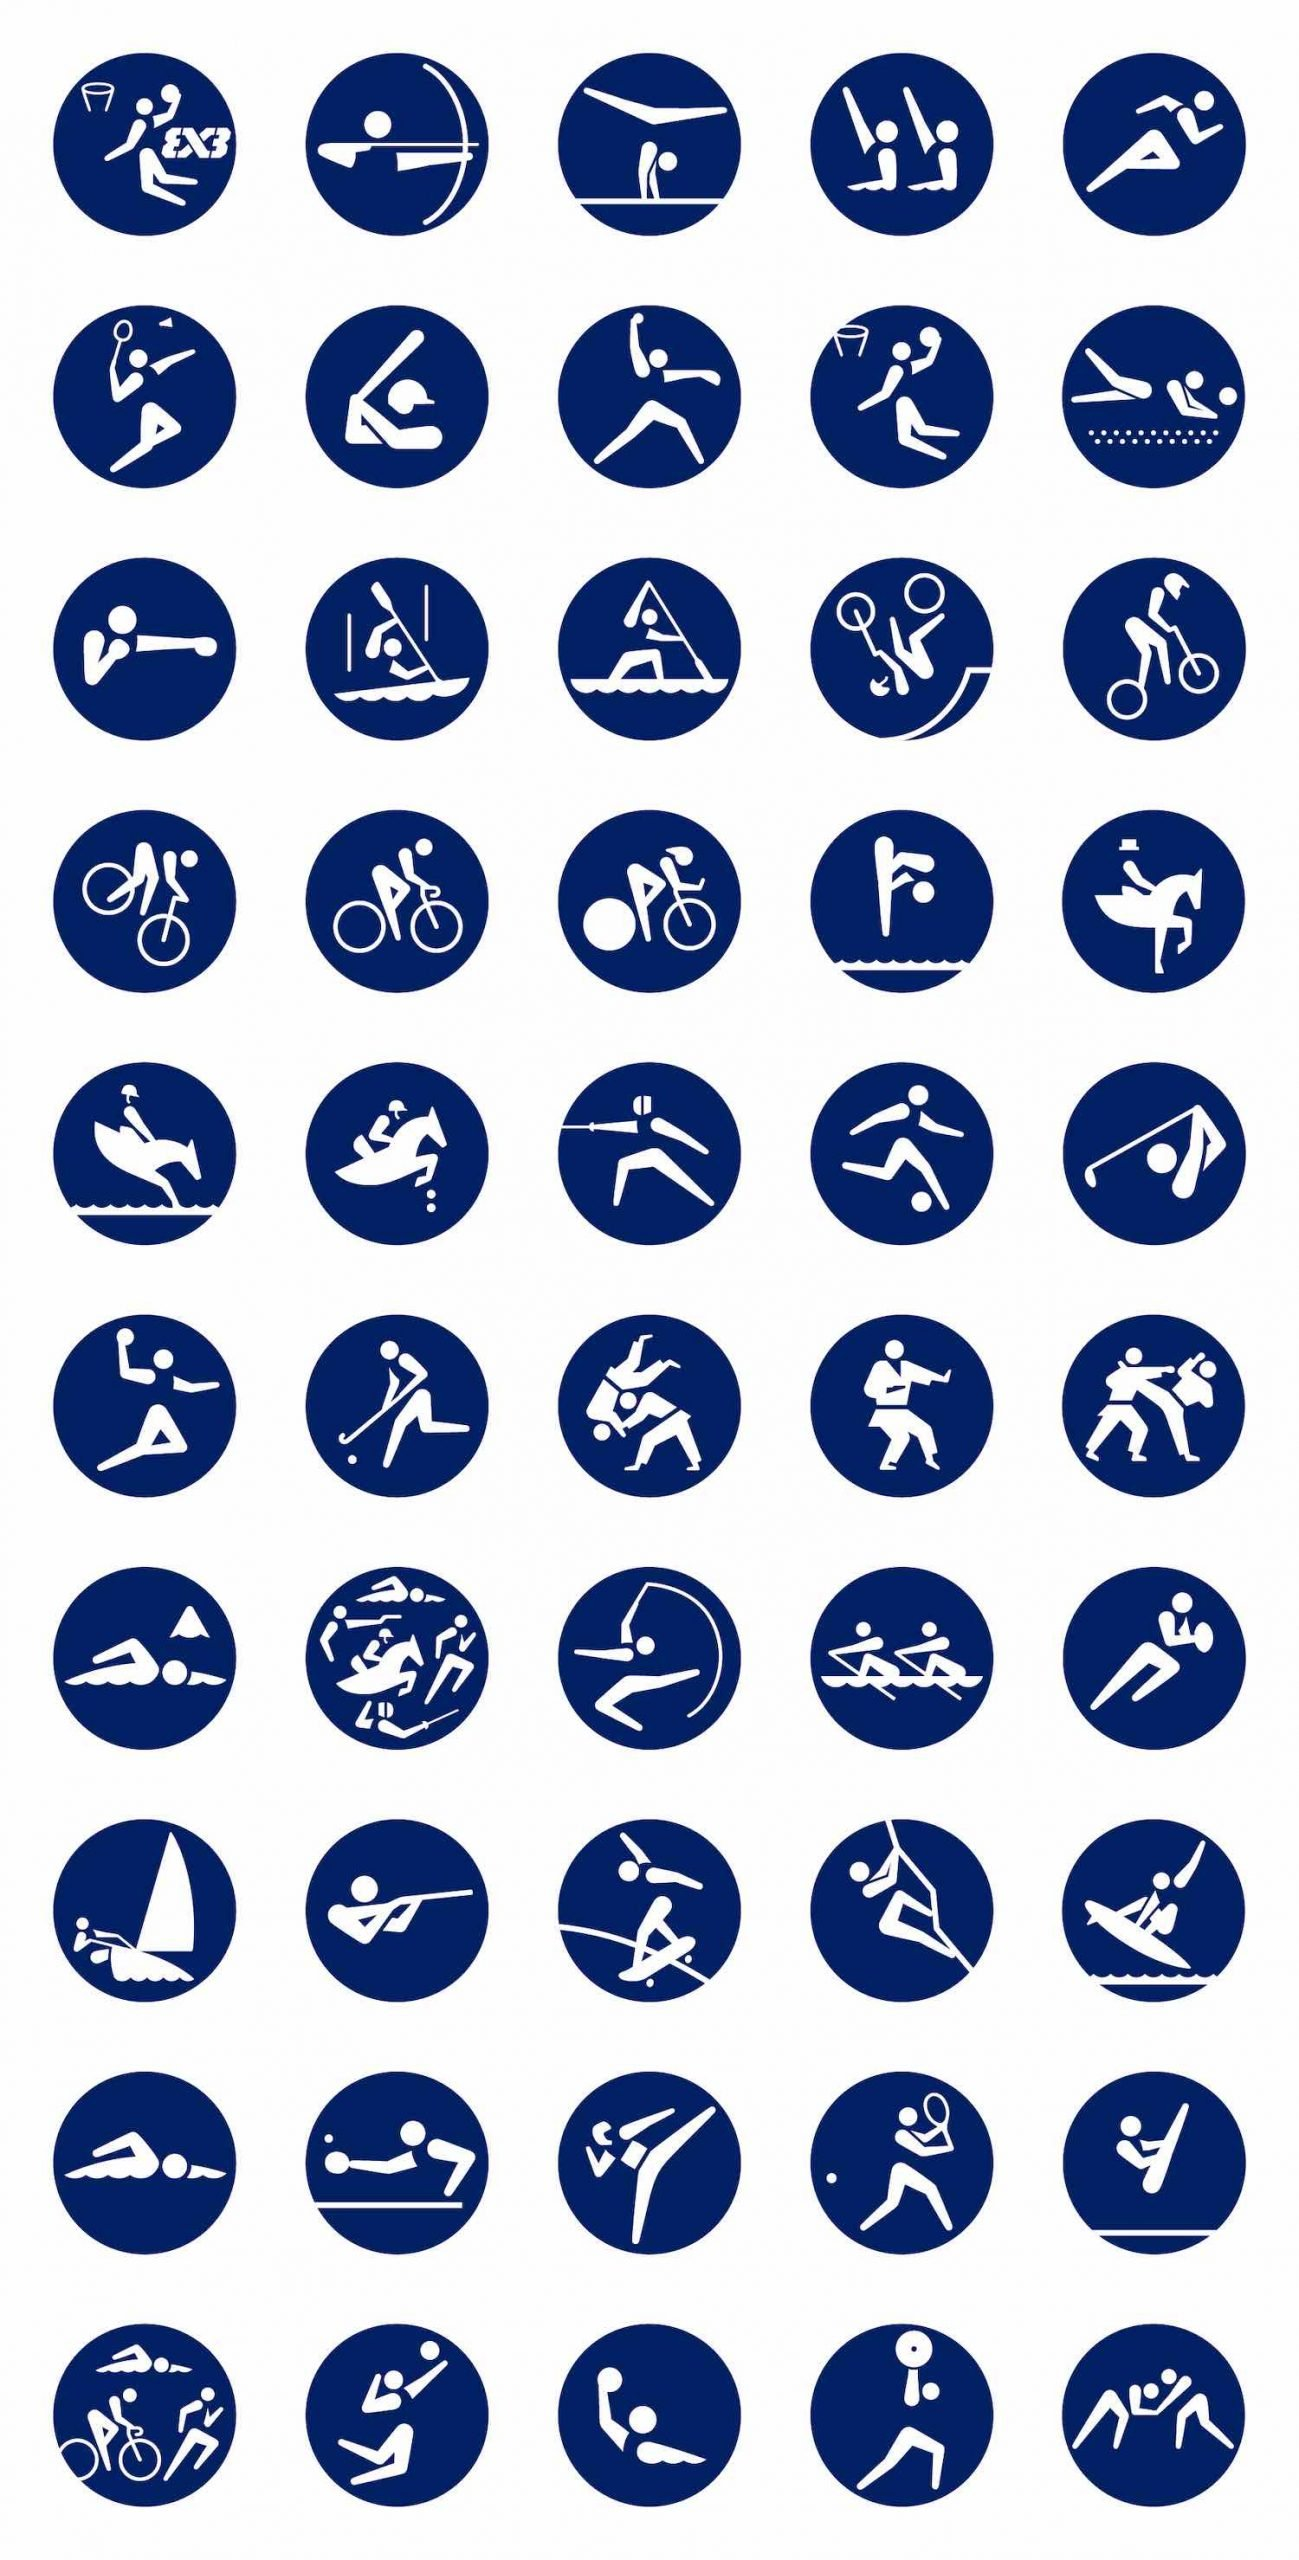 Tokyo Olympics' design